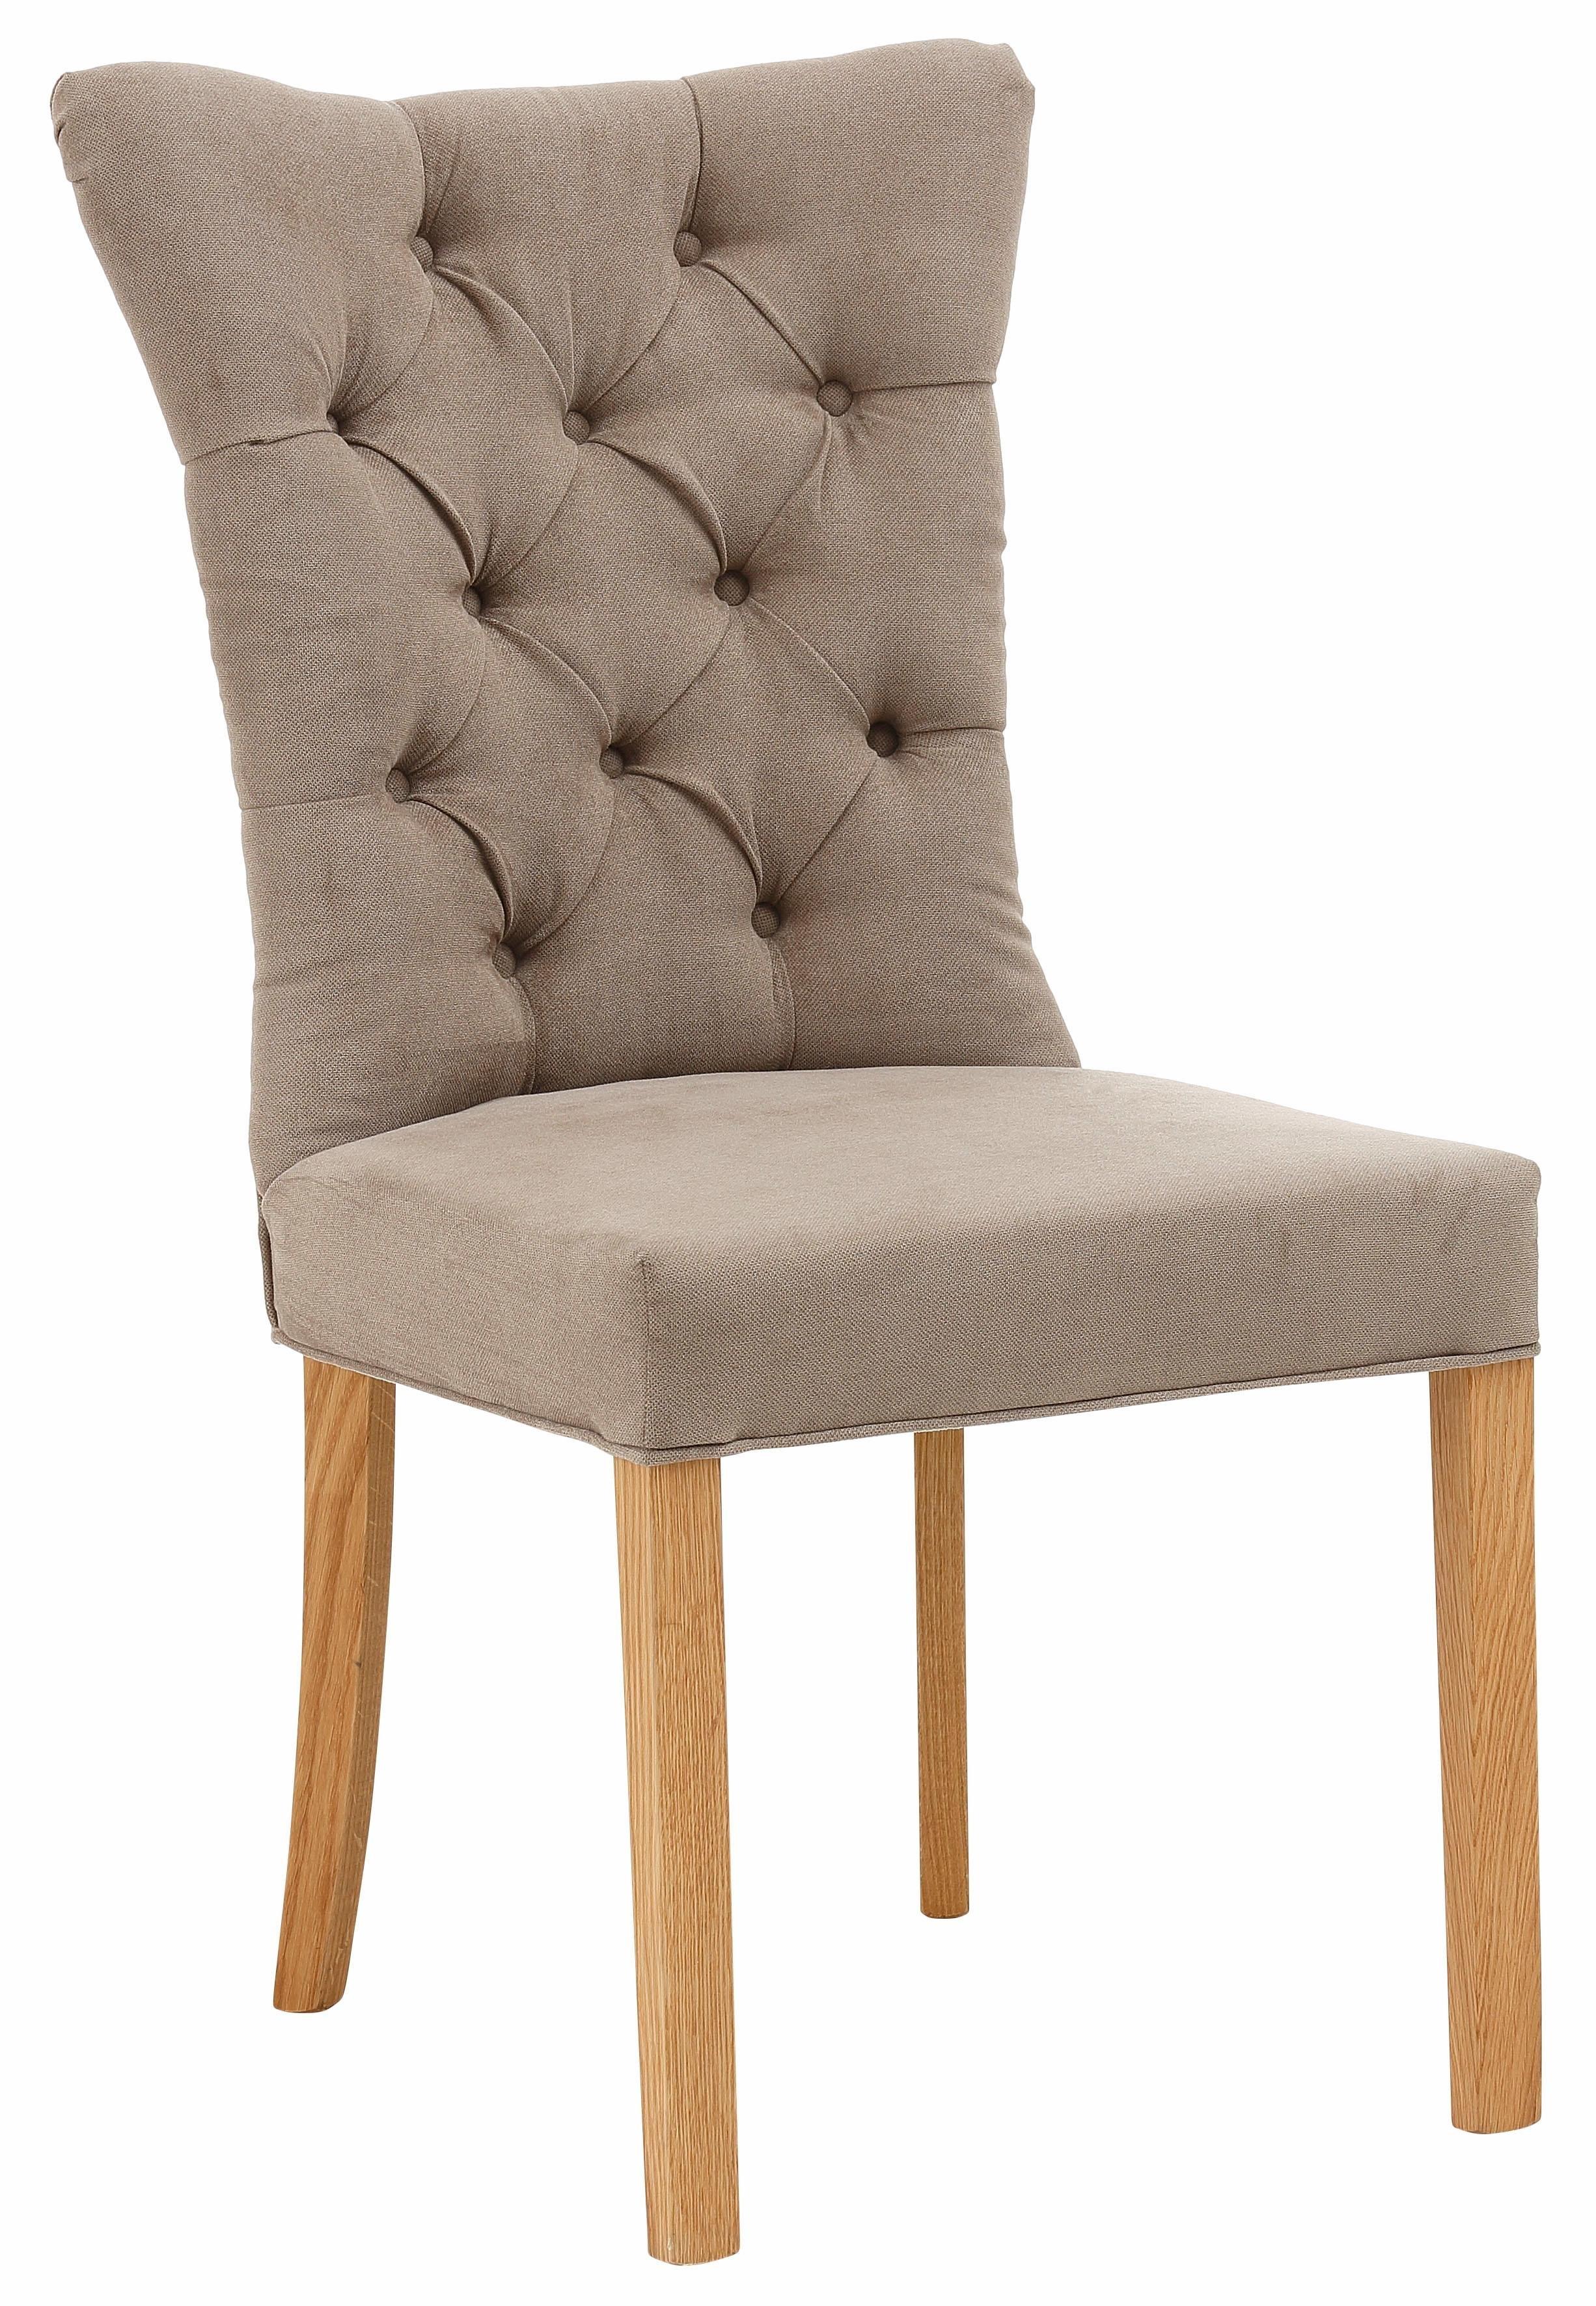 Stoel met leuning best tine k home bamboe eetkamer stoel for Stuhl gepolstert